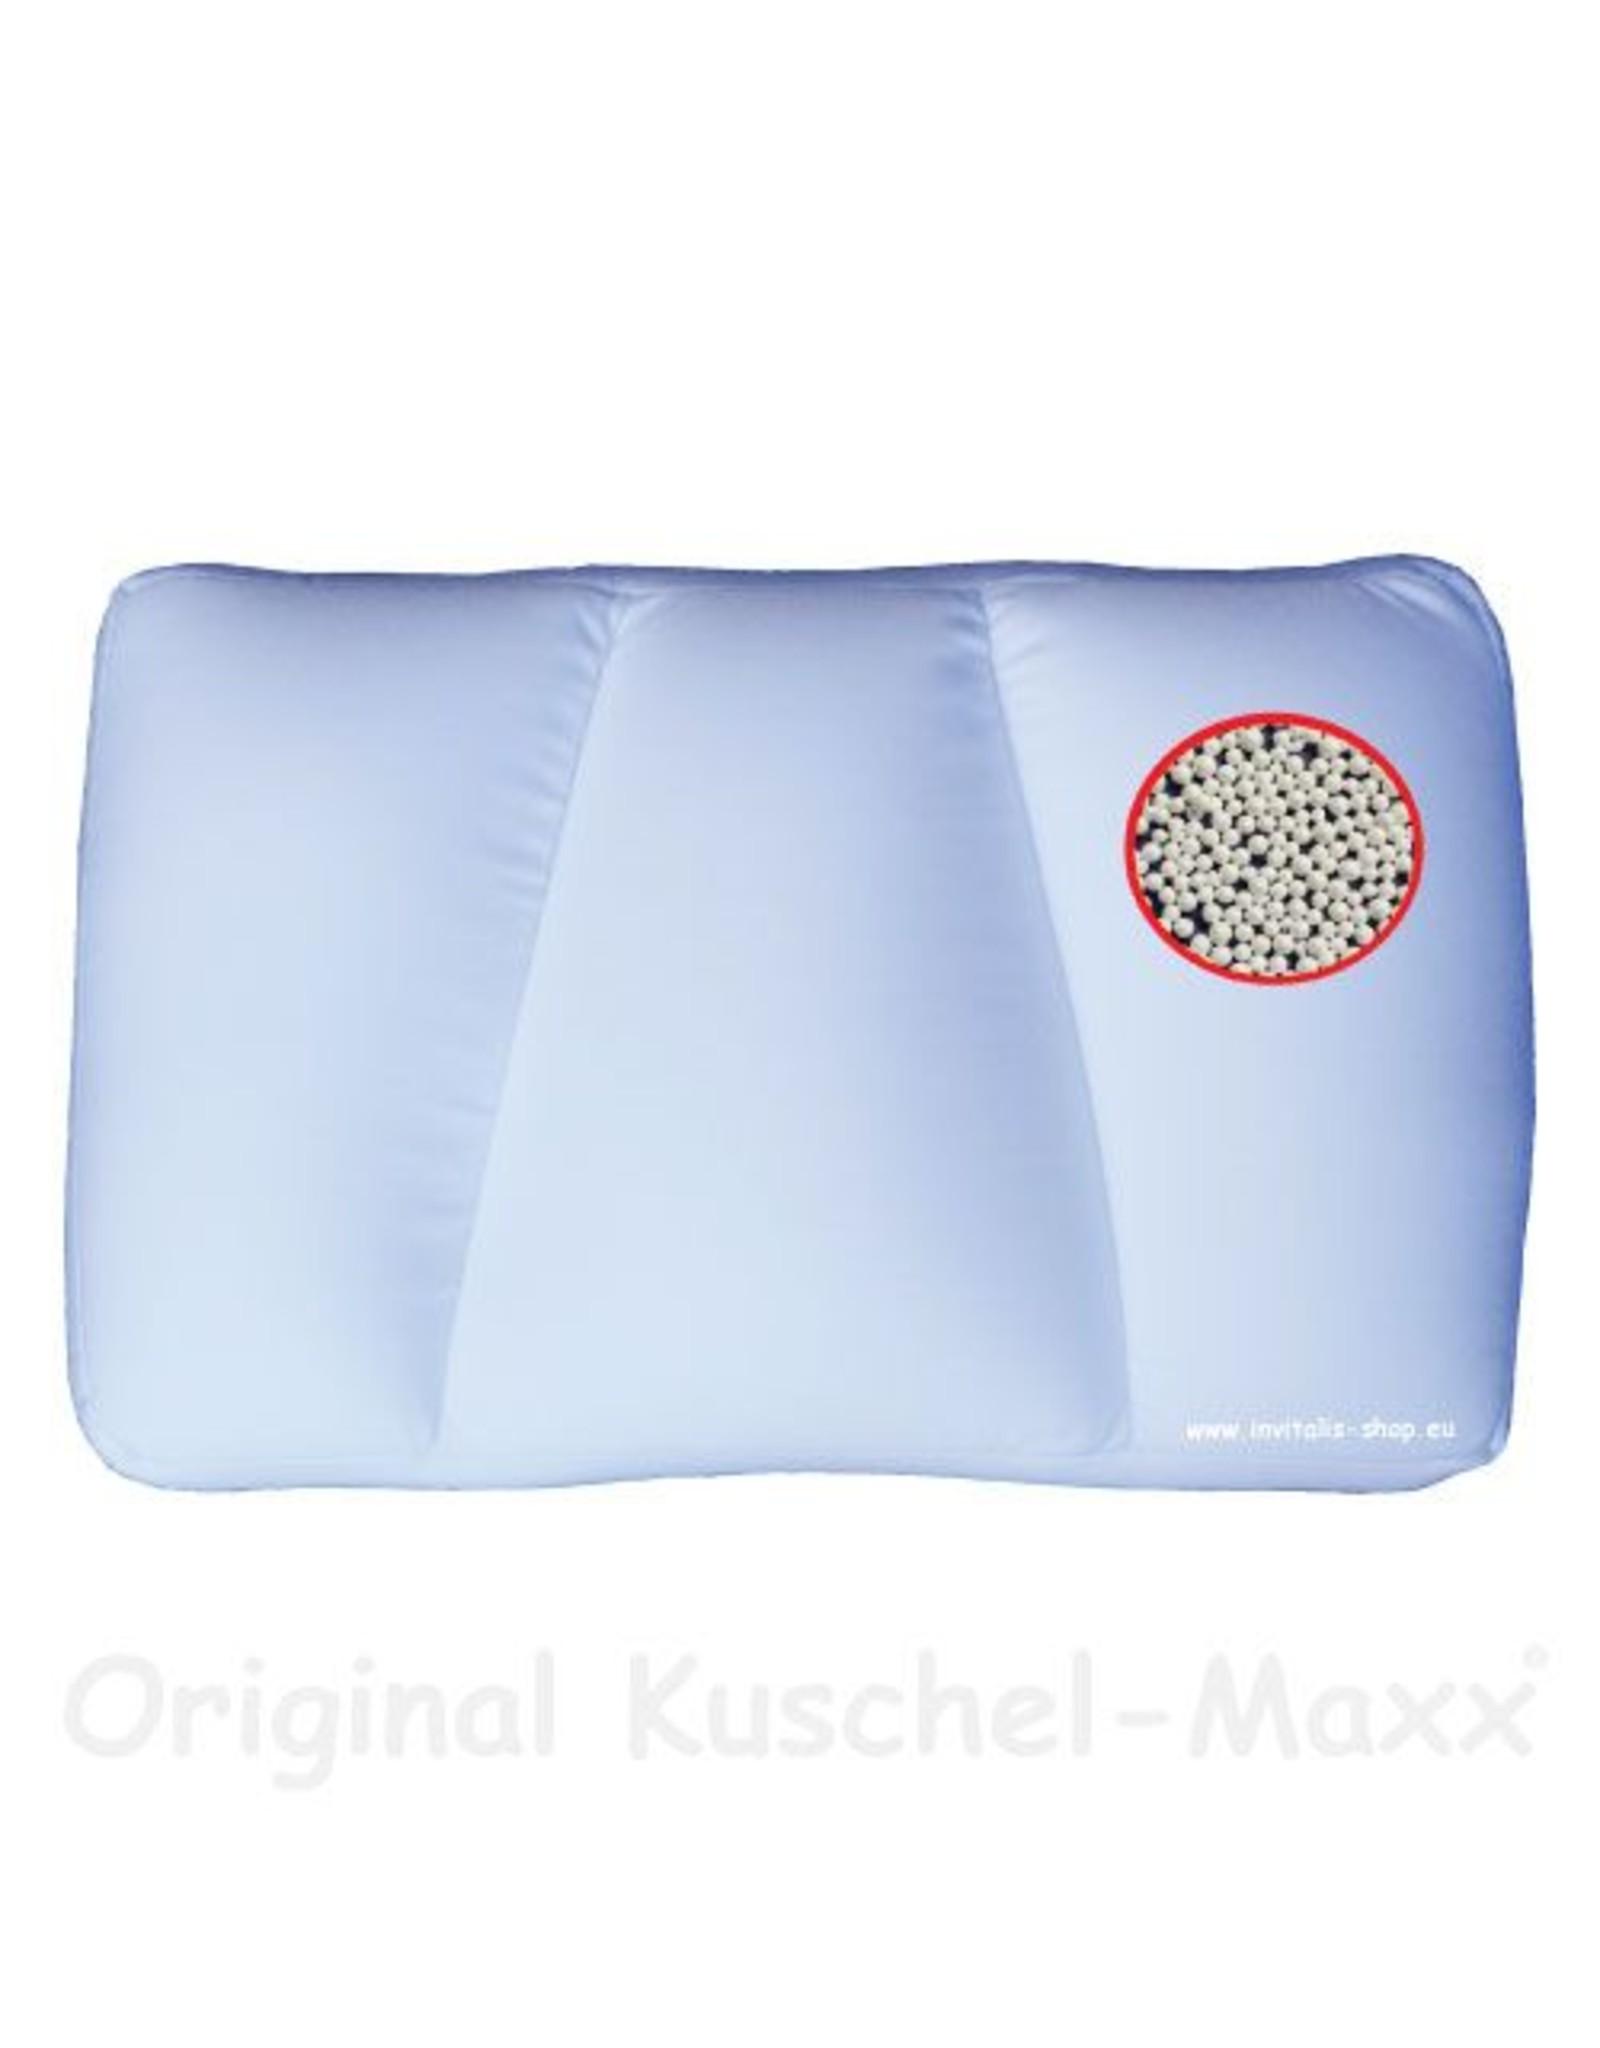 Kuschel-Maxx Kuschel-Maxx - Sleeppillow White